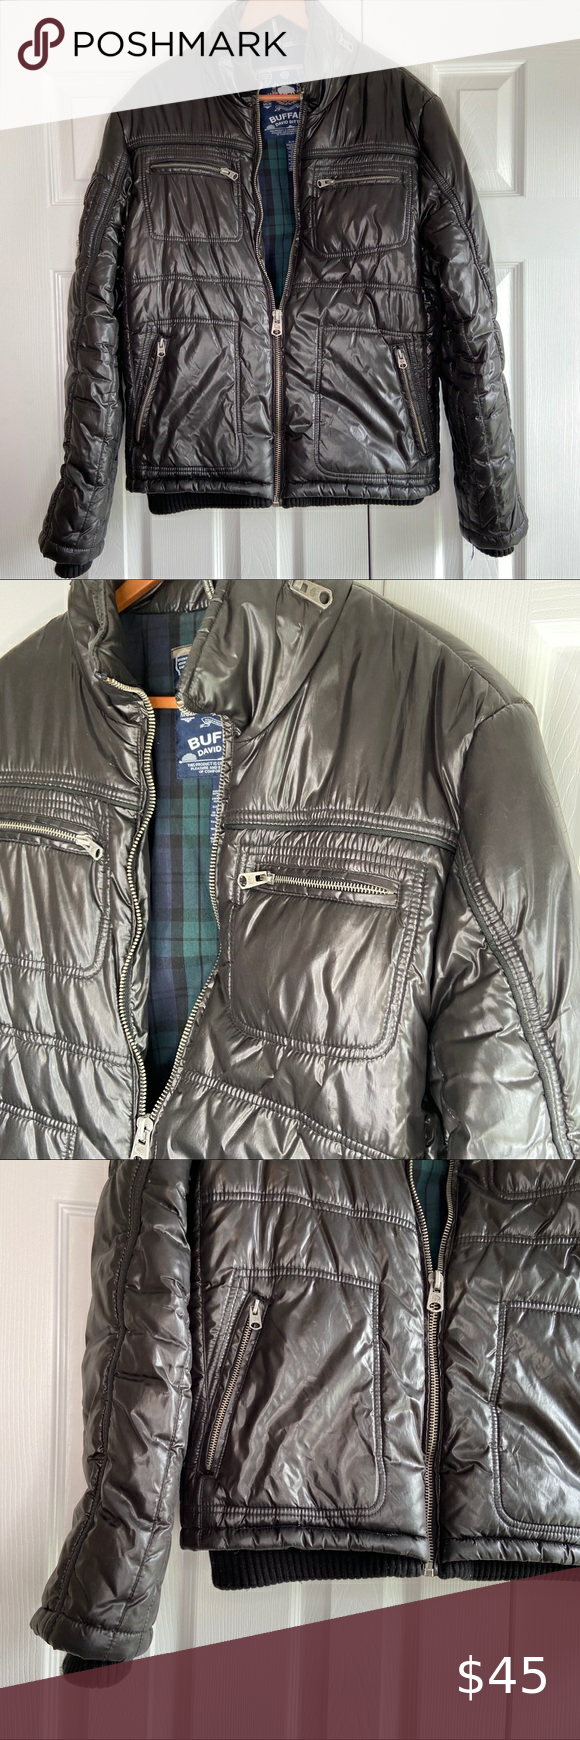 Buffalo David Bitton Black Outerwear Jacket Black Outerwear Outerwear Jackets Jackets [ 1740 x 580 Pixel ]